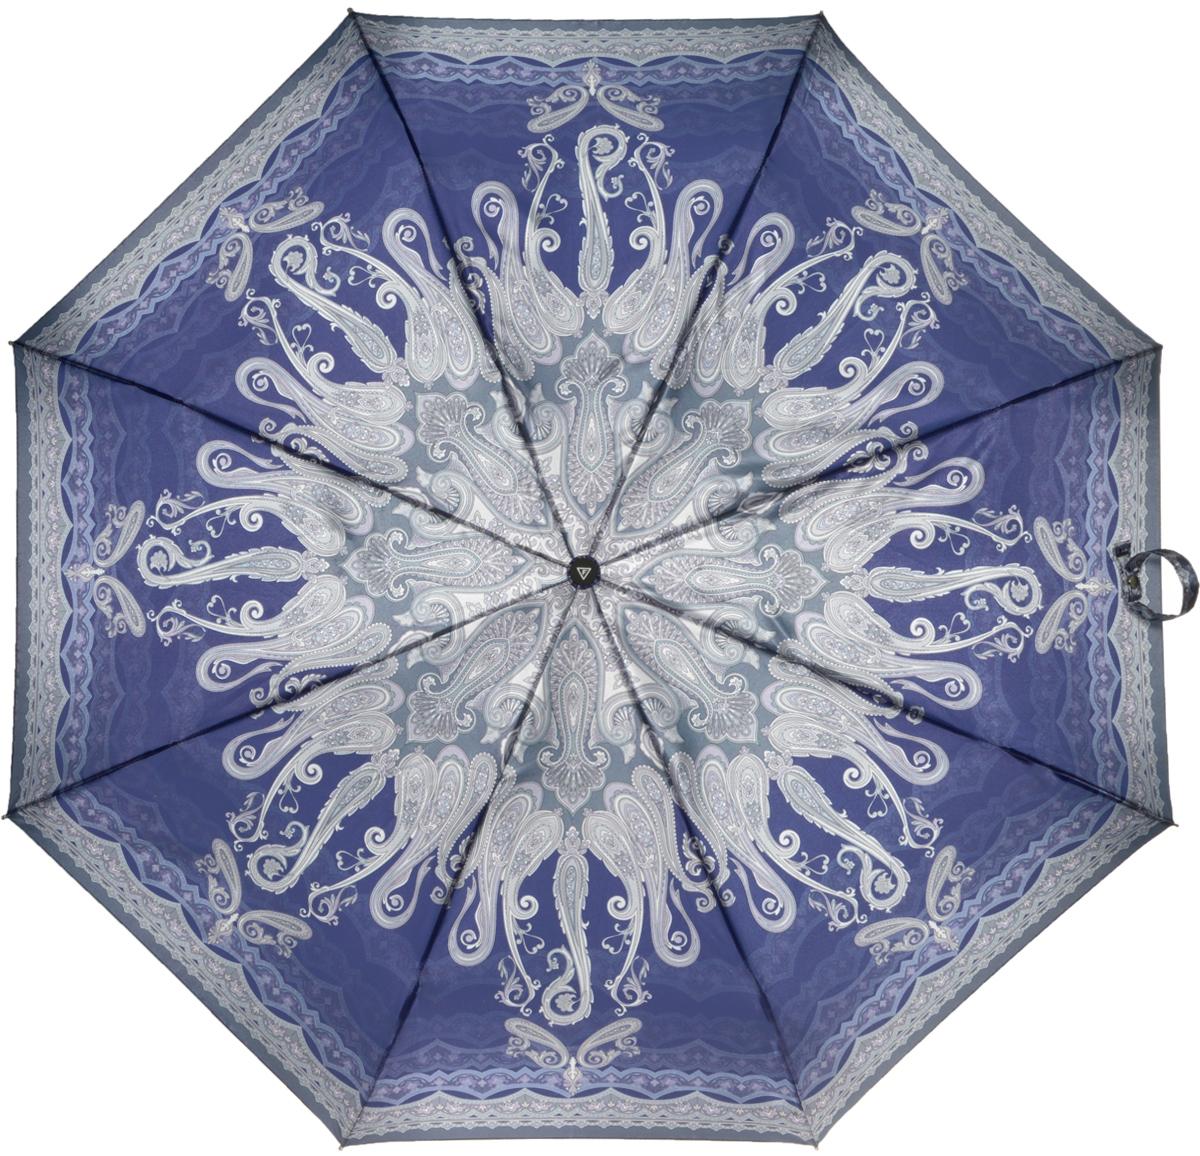 Зонт женский Fabretti, автомат, 3 сложения, цвет: серый. L-16105-16L-16105-16Зонт женский Fabretti, облегченный суперавтомат, 3 сложения